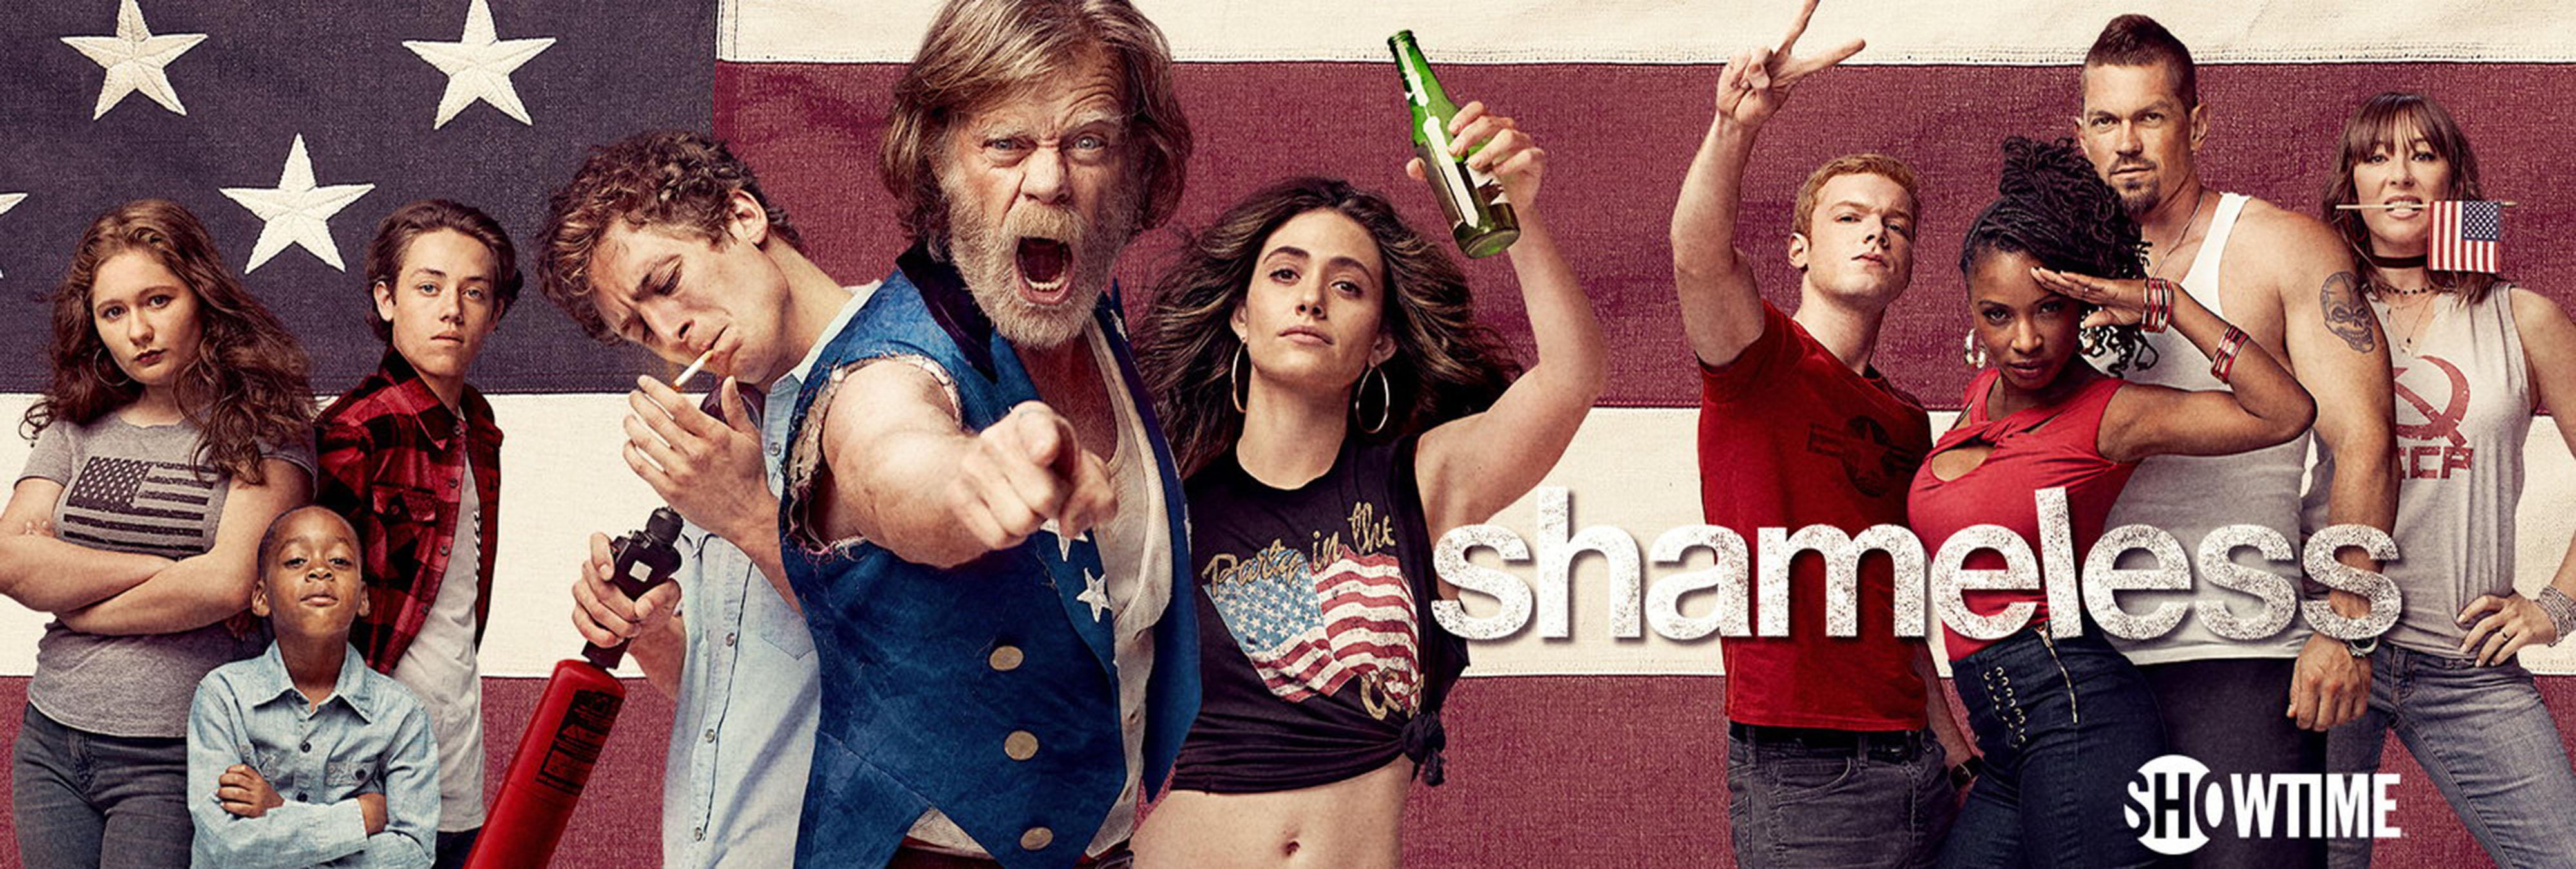 7 motivos por los que debes ver 'Shameless'